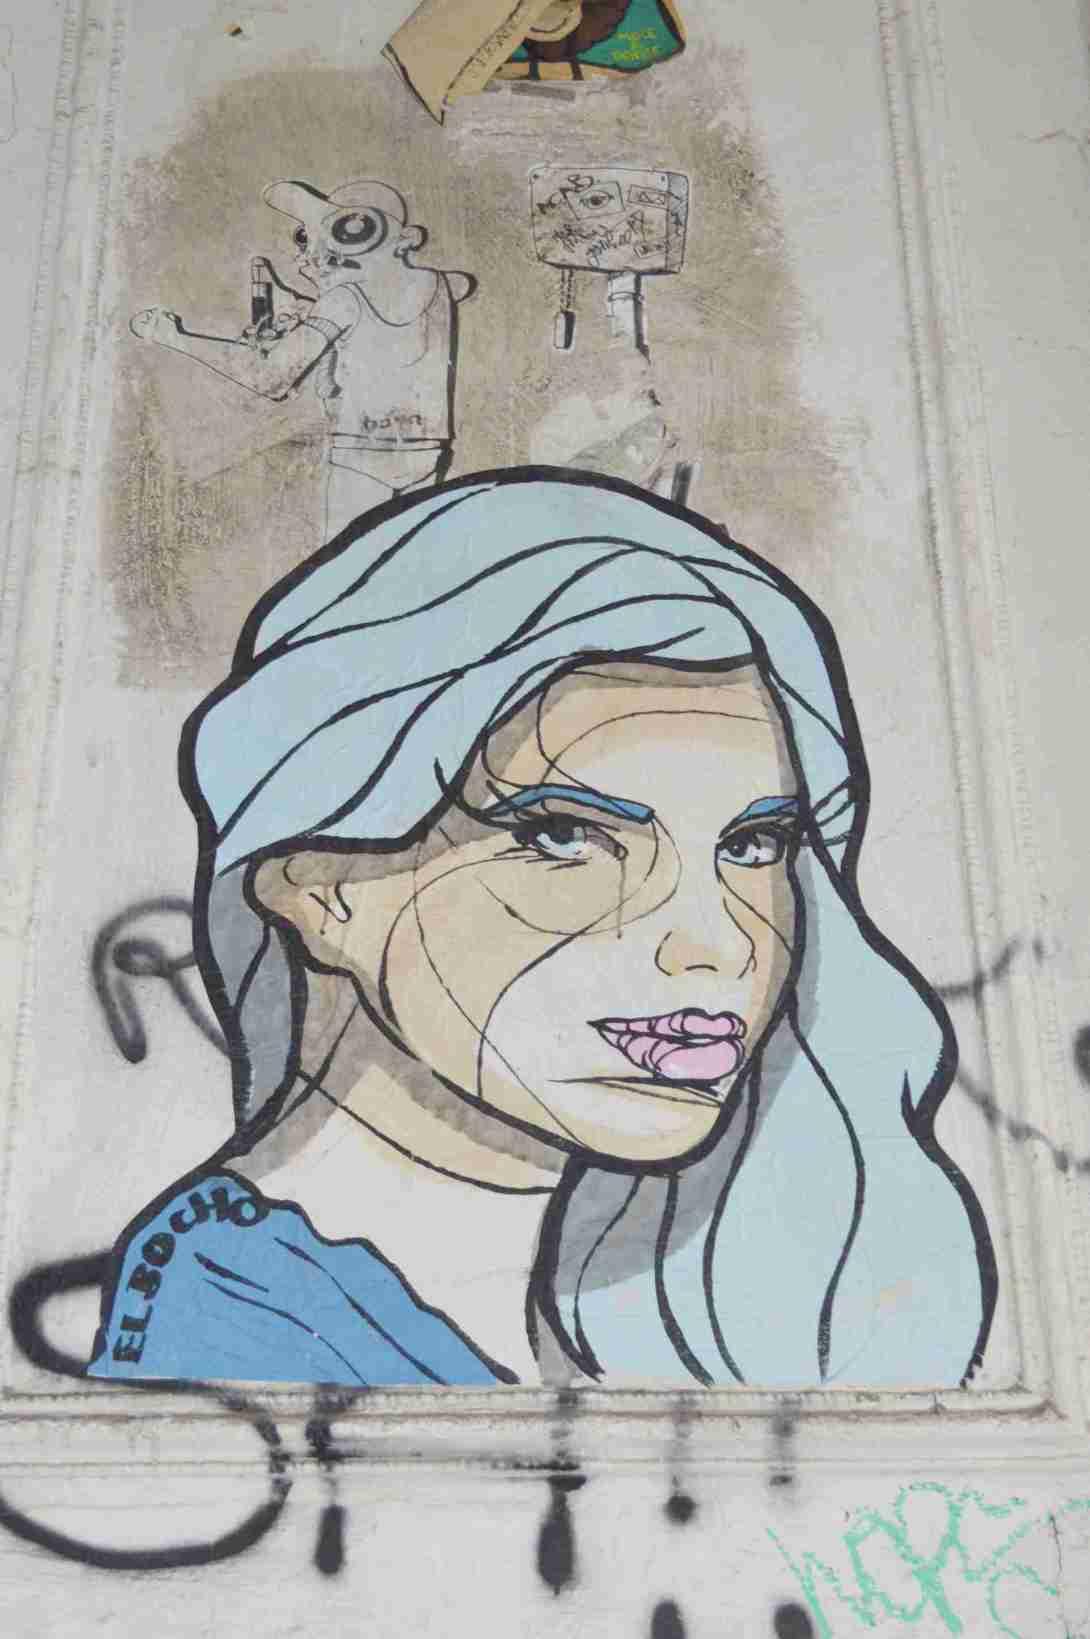 El Bocho Lady Street Art Berlin strassenkunst Prenzlauer Berg street art be kitschig blog